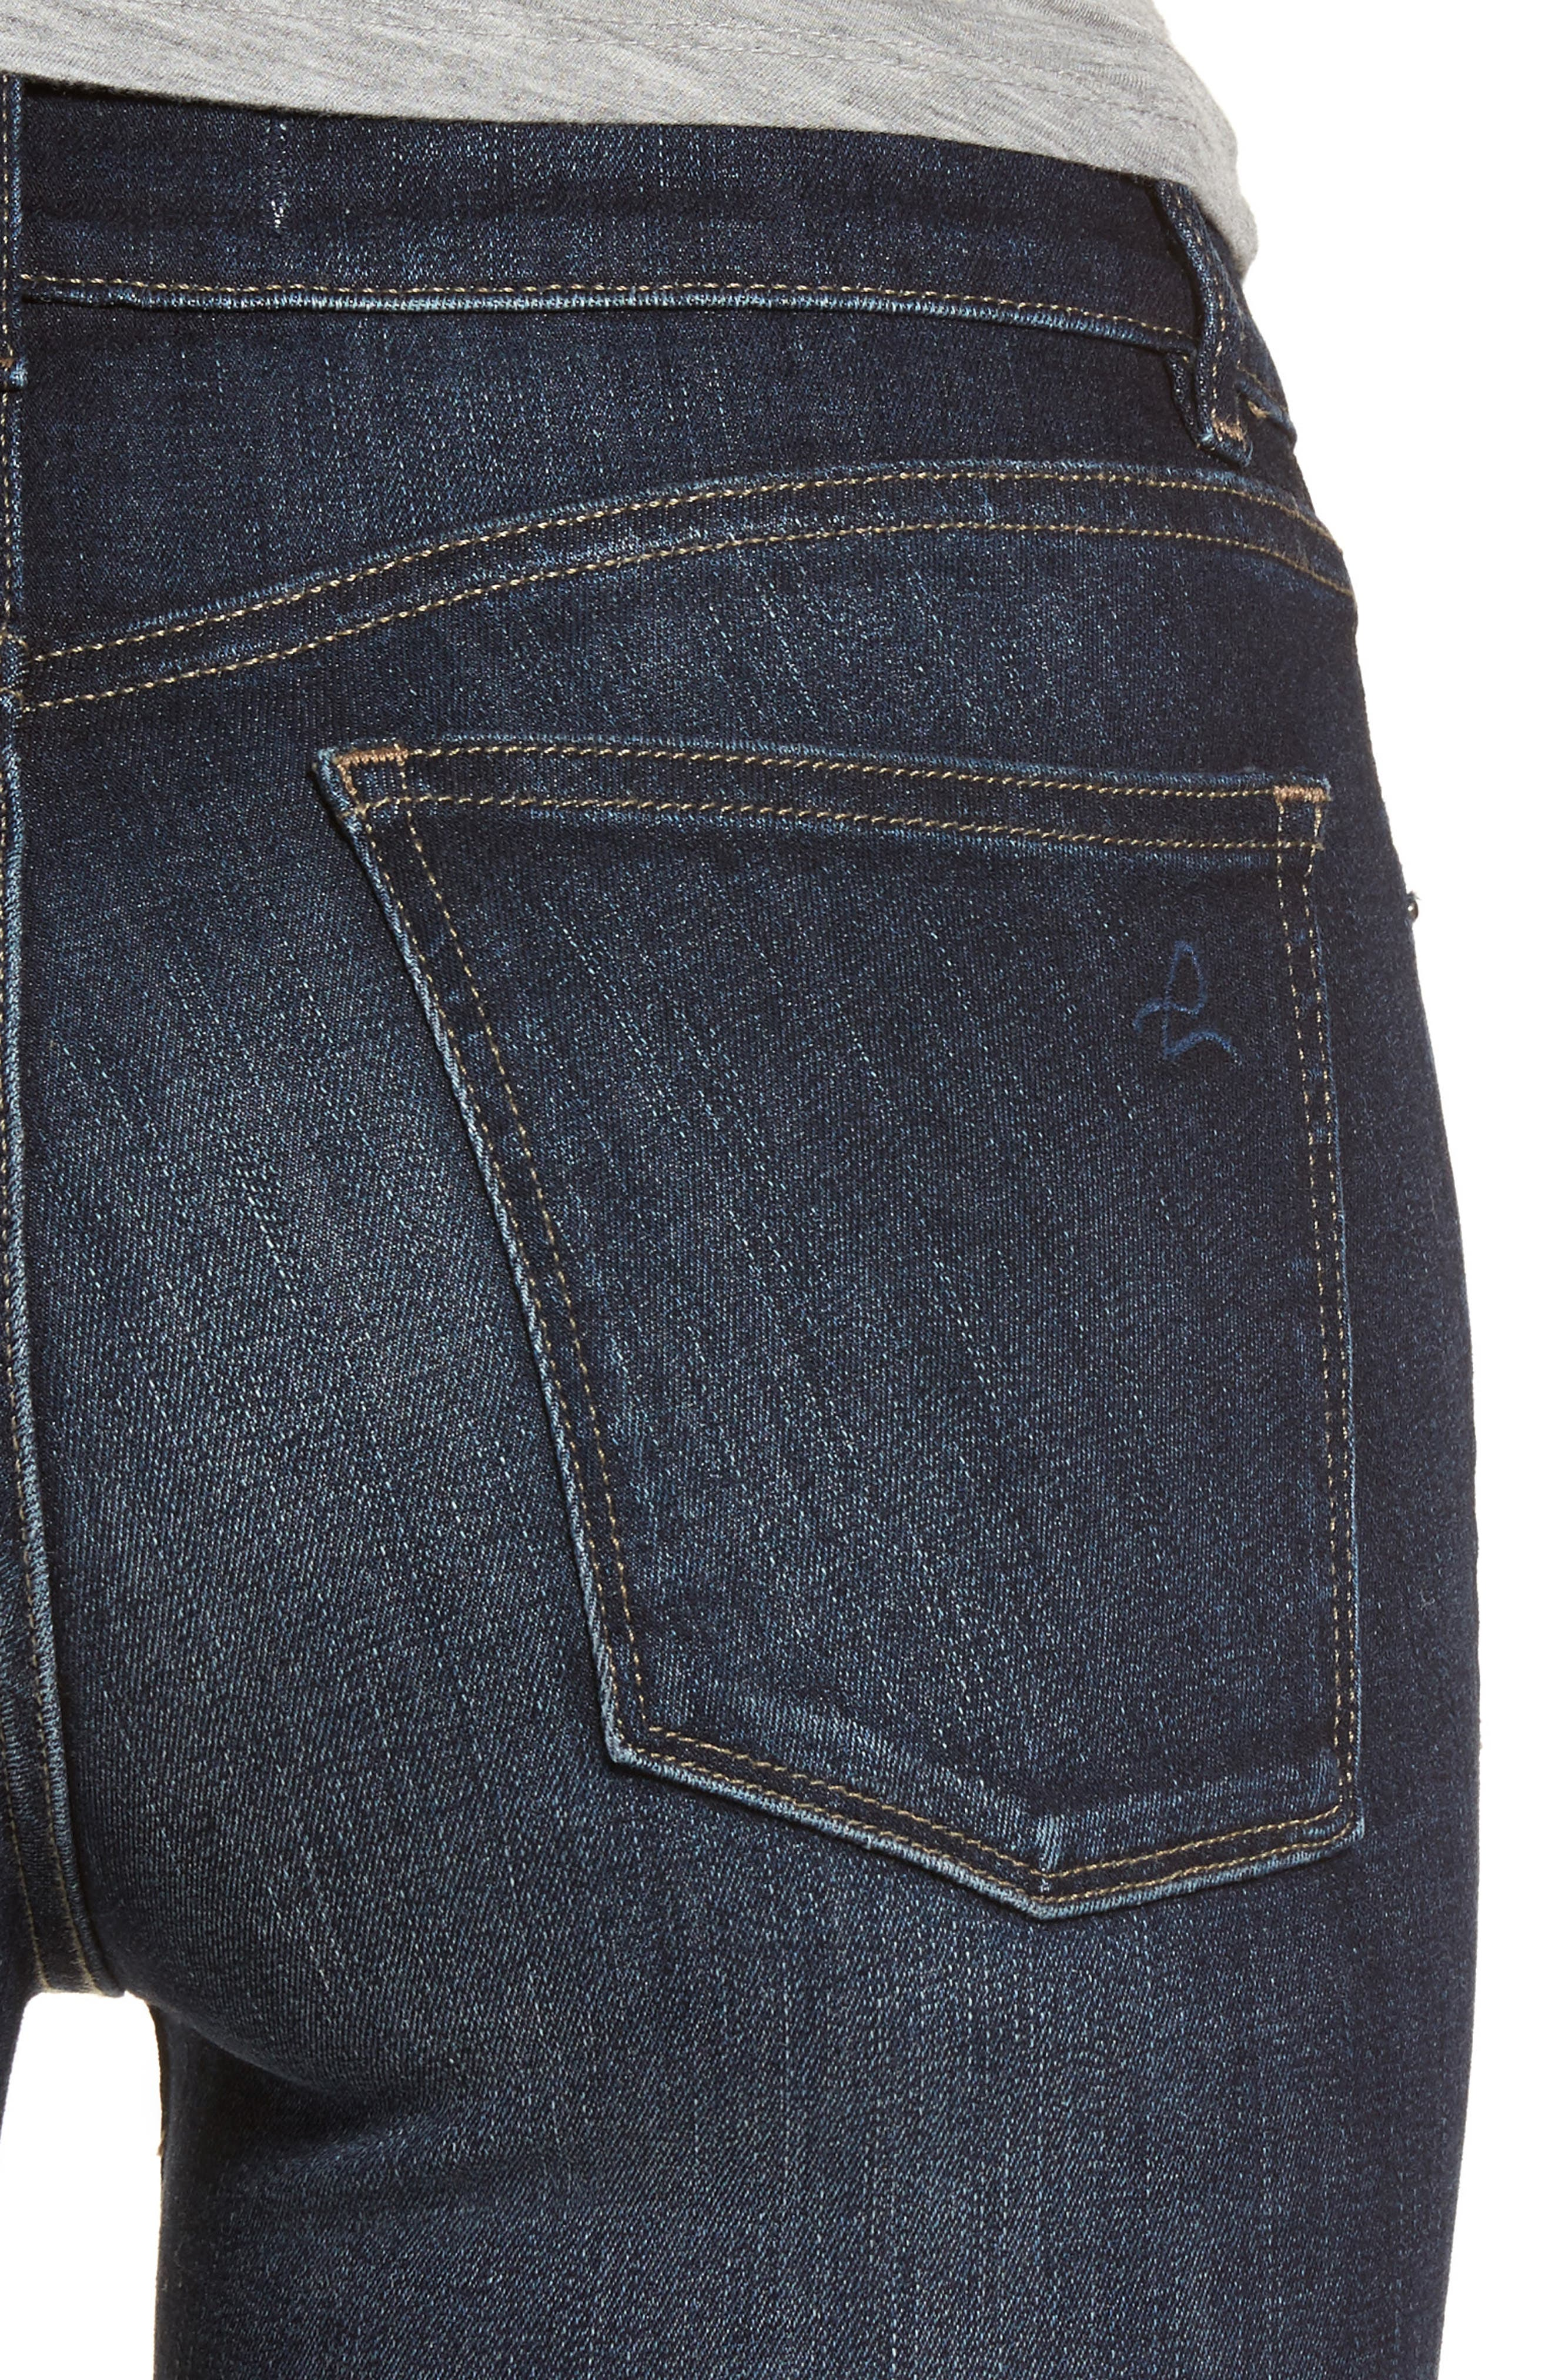 Danny Instasculpt Supermodel Skinny Jeans,                             Alternate thumbnail 4, color,                             405